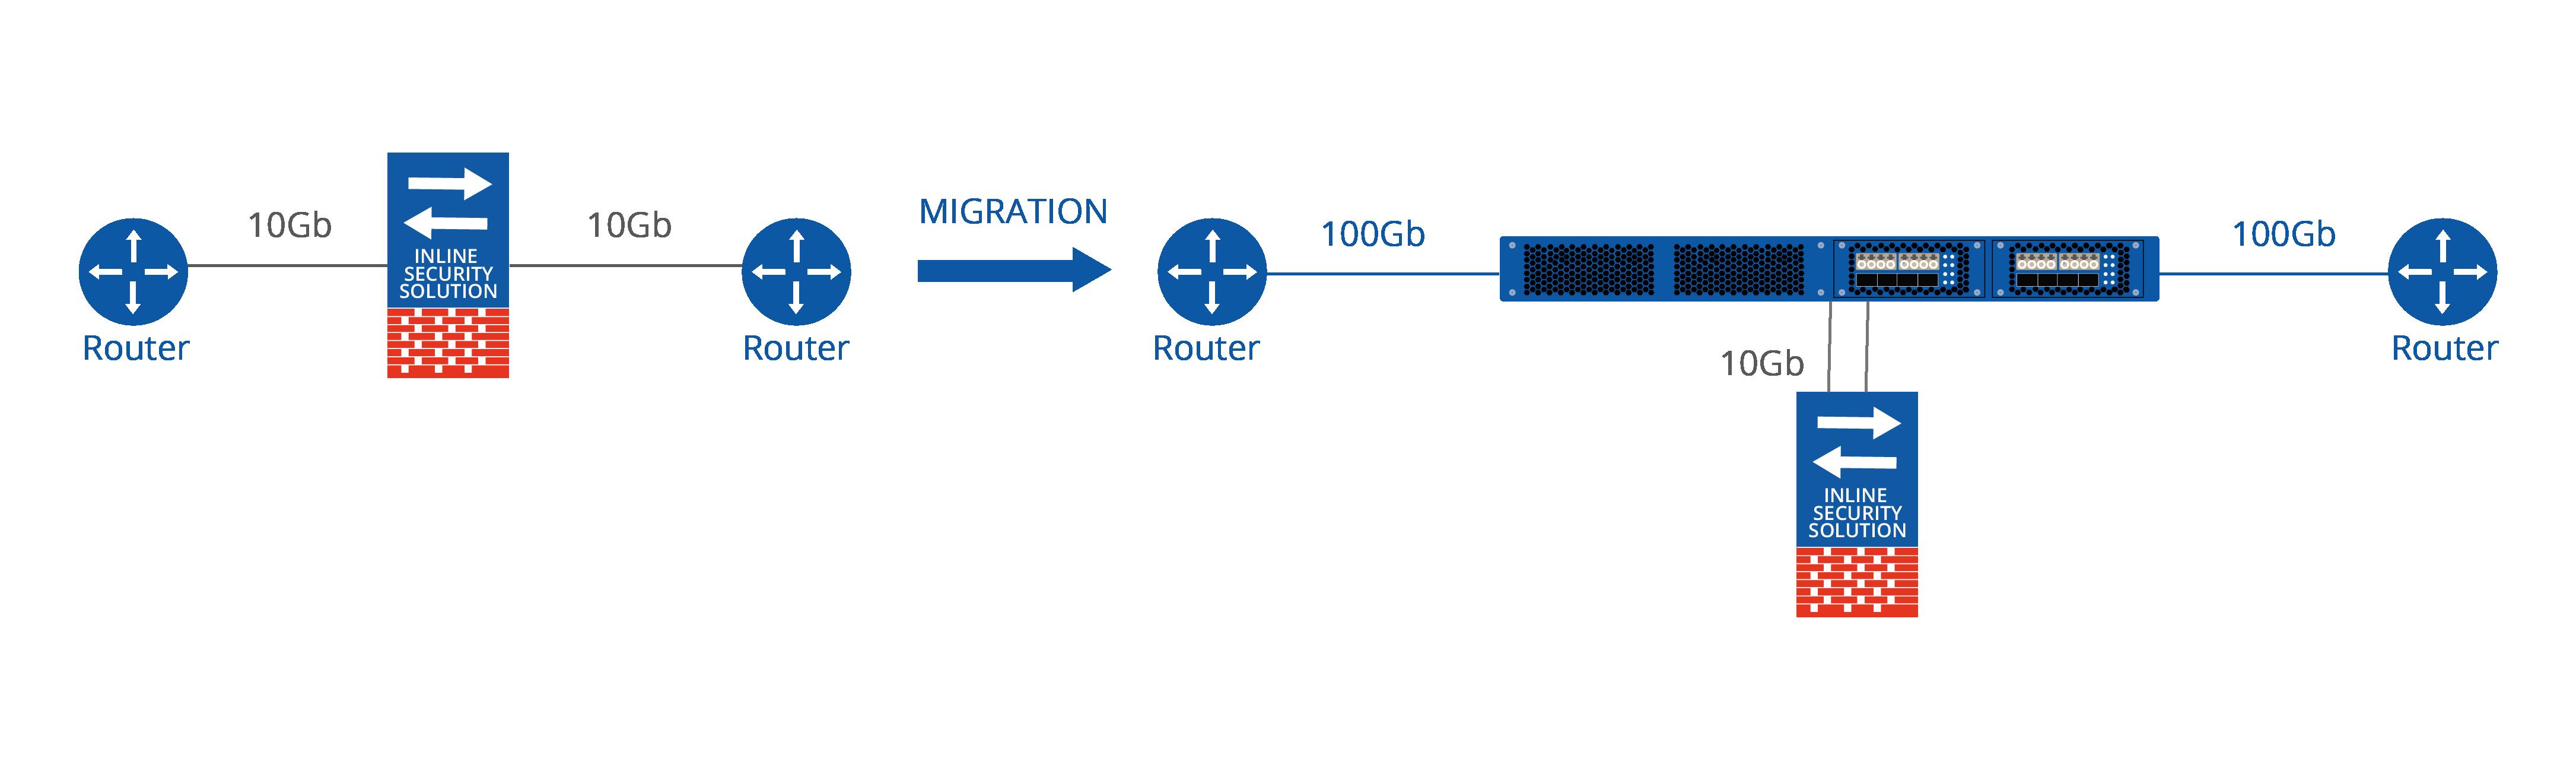 10Gb - 100Gb Migration diagram (1).png